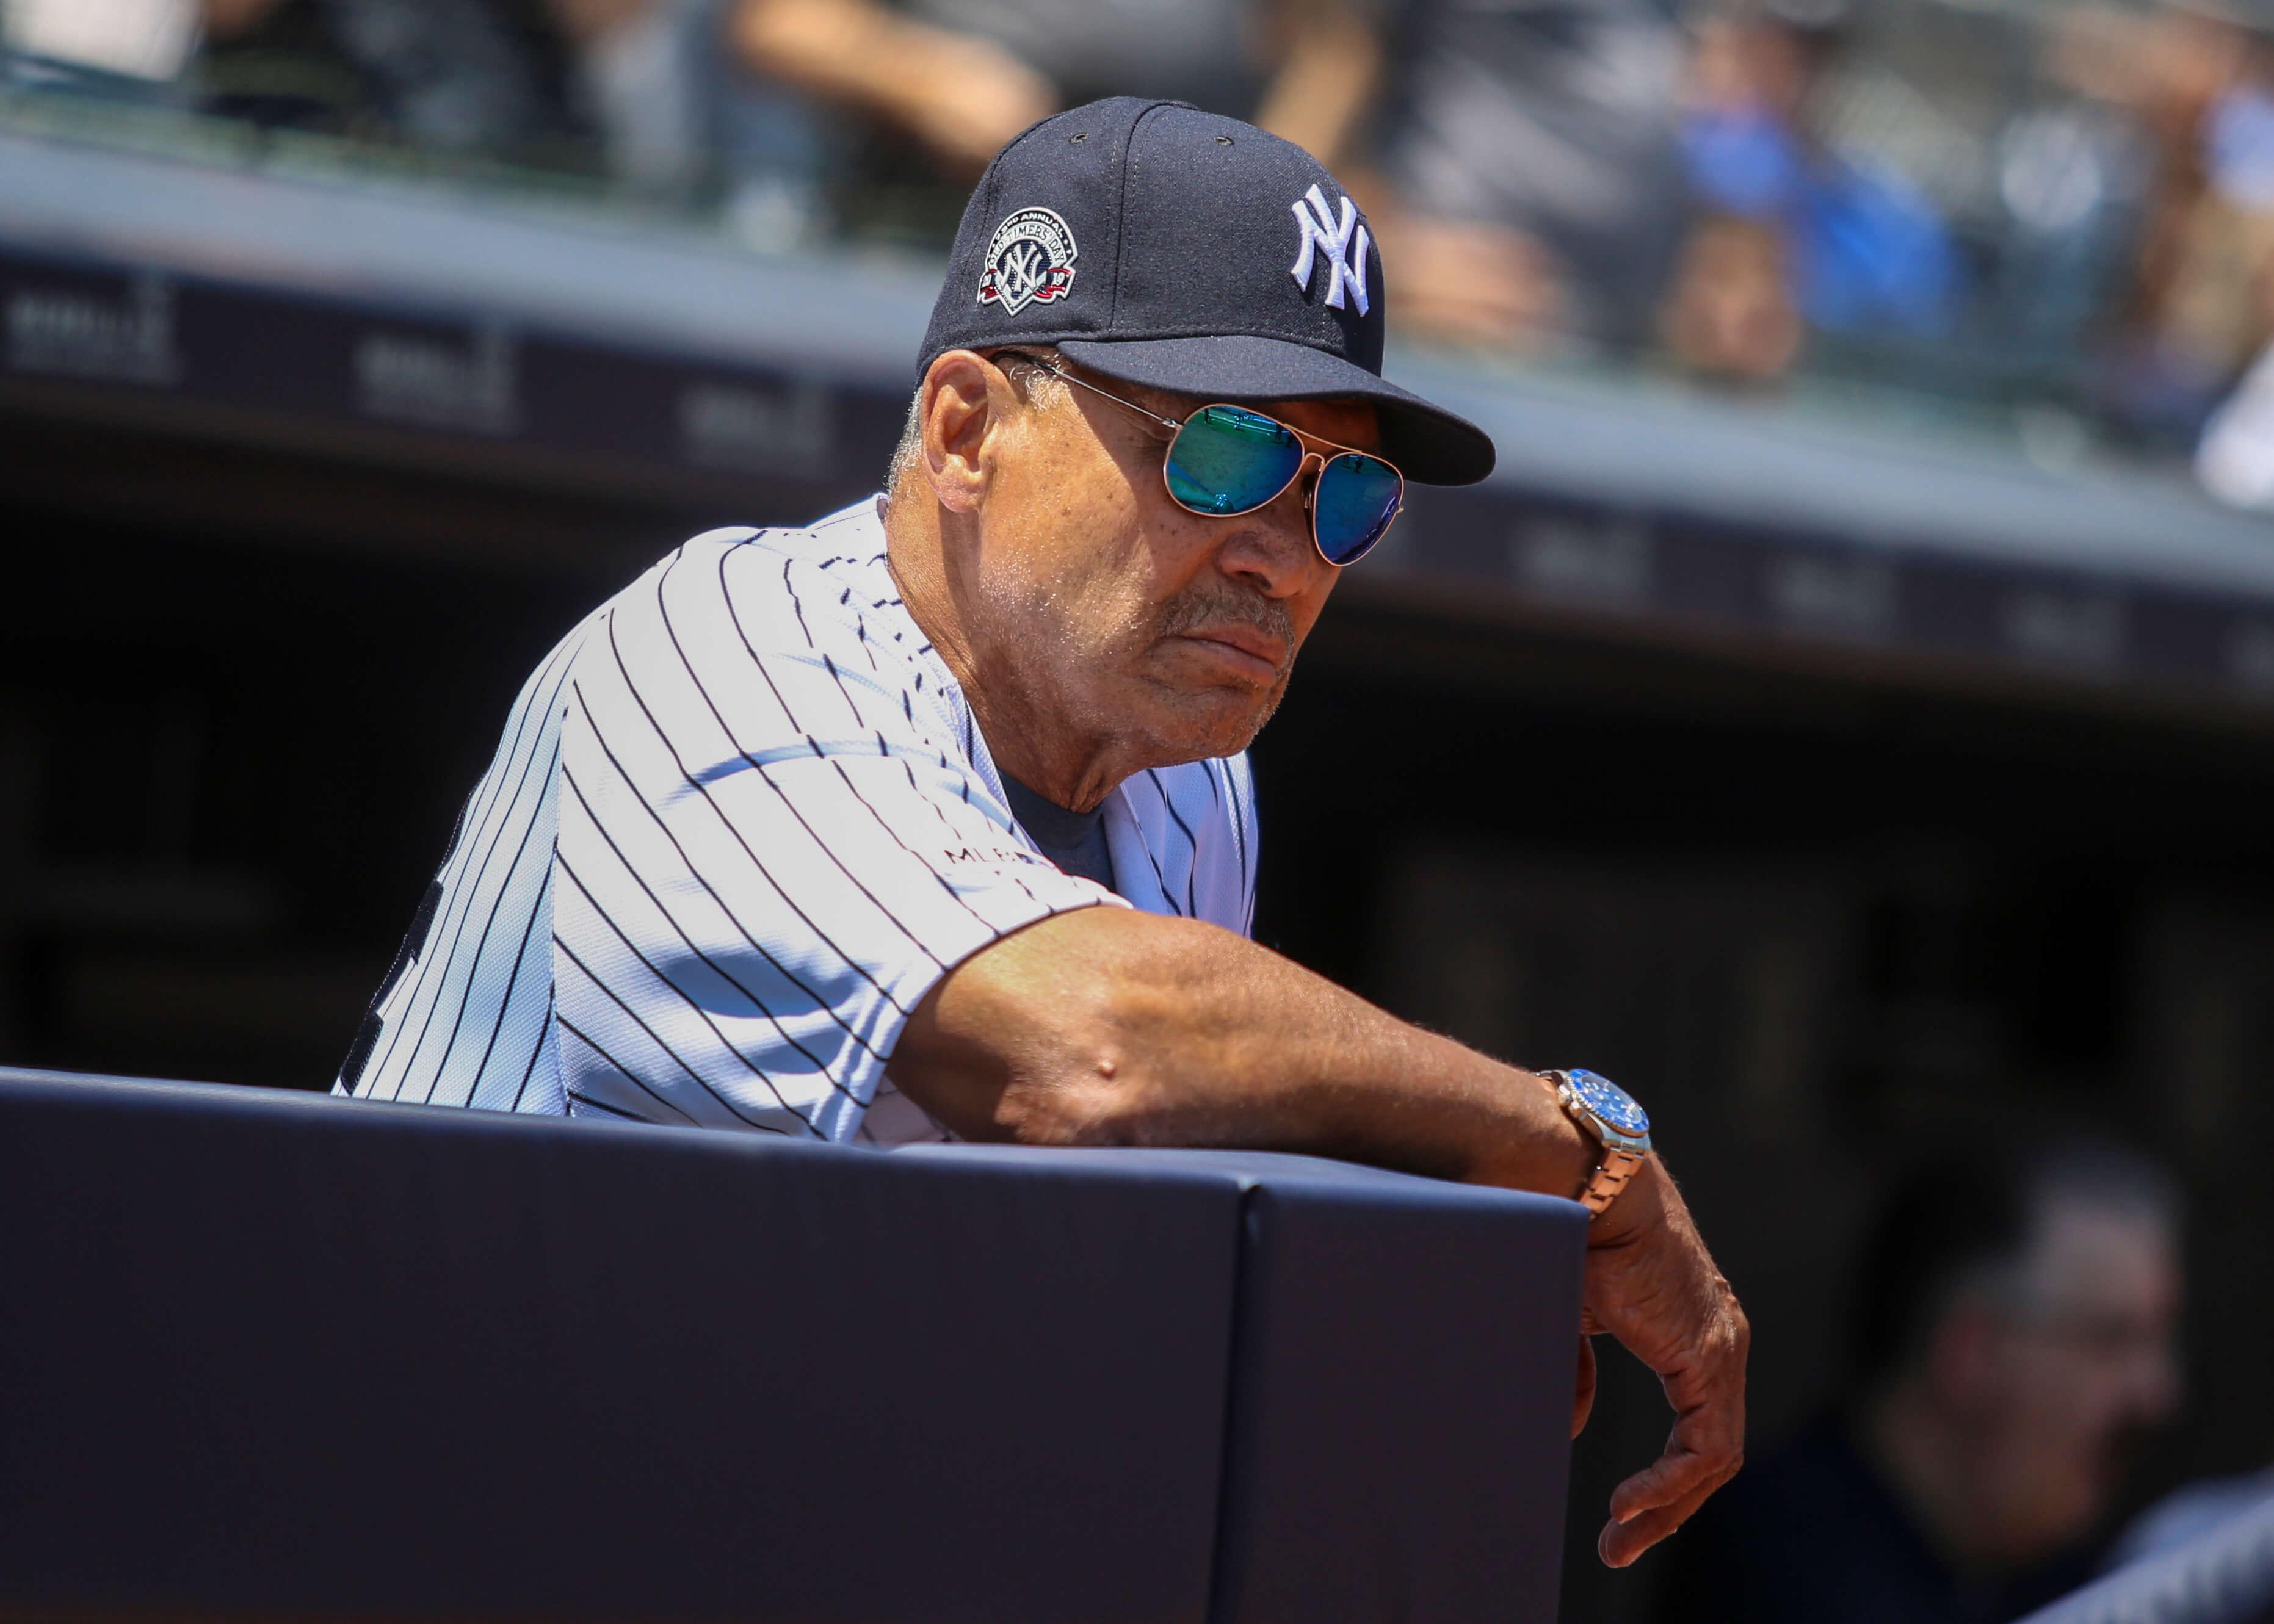 New York Yankees, Reggie Jackson